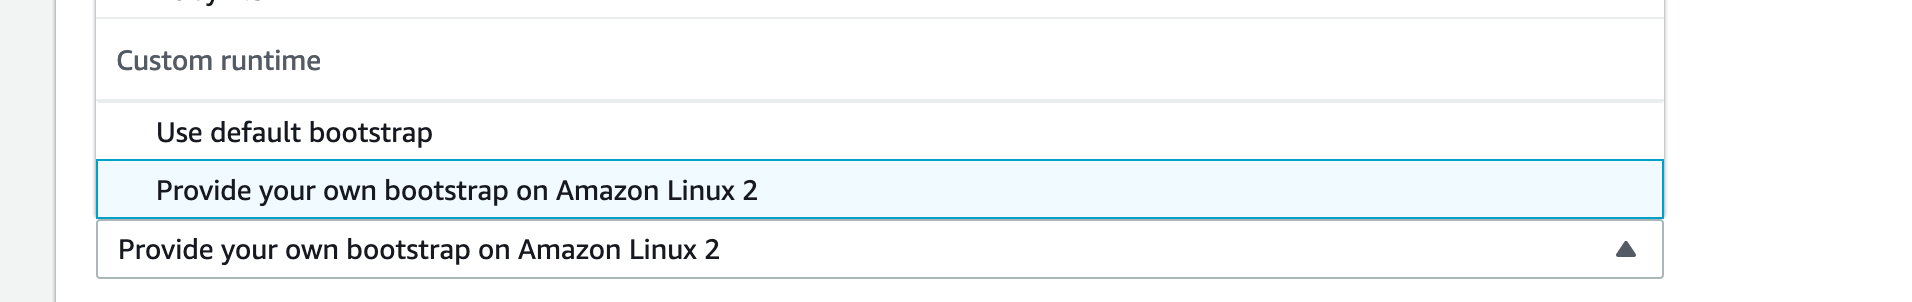 Select Custom Runtime